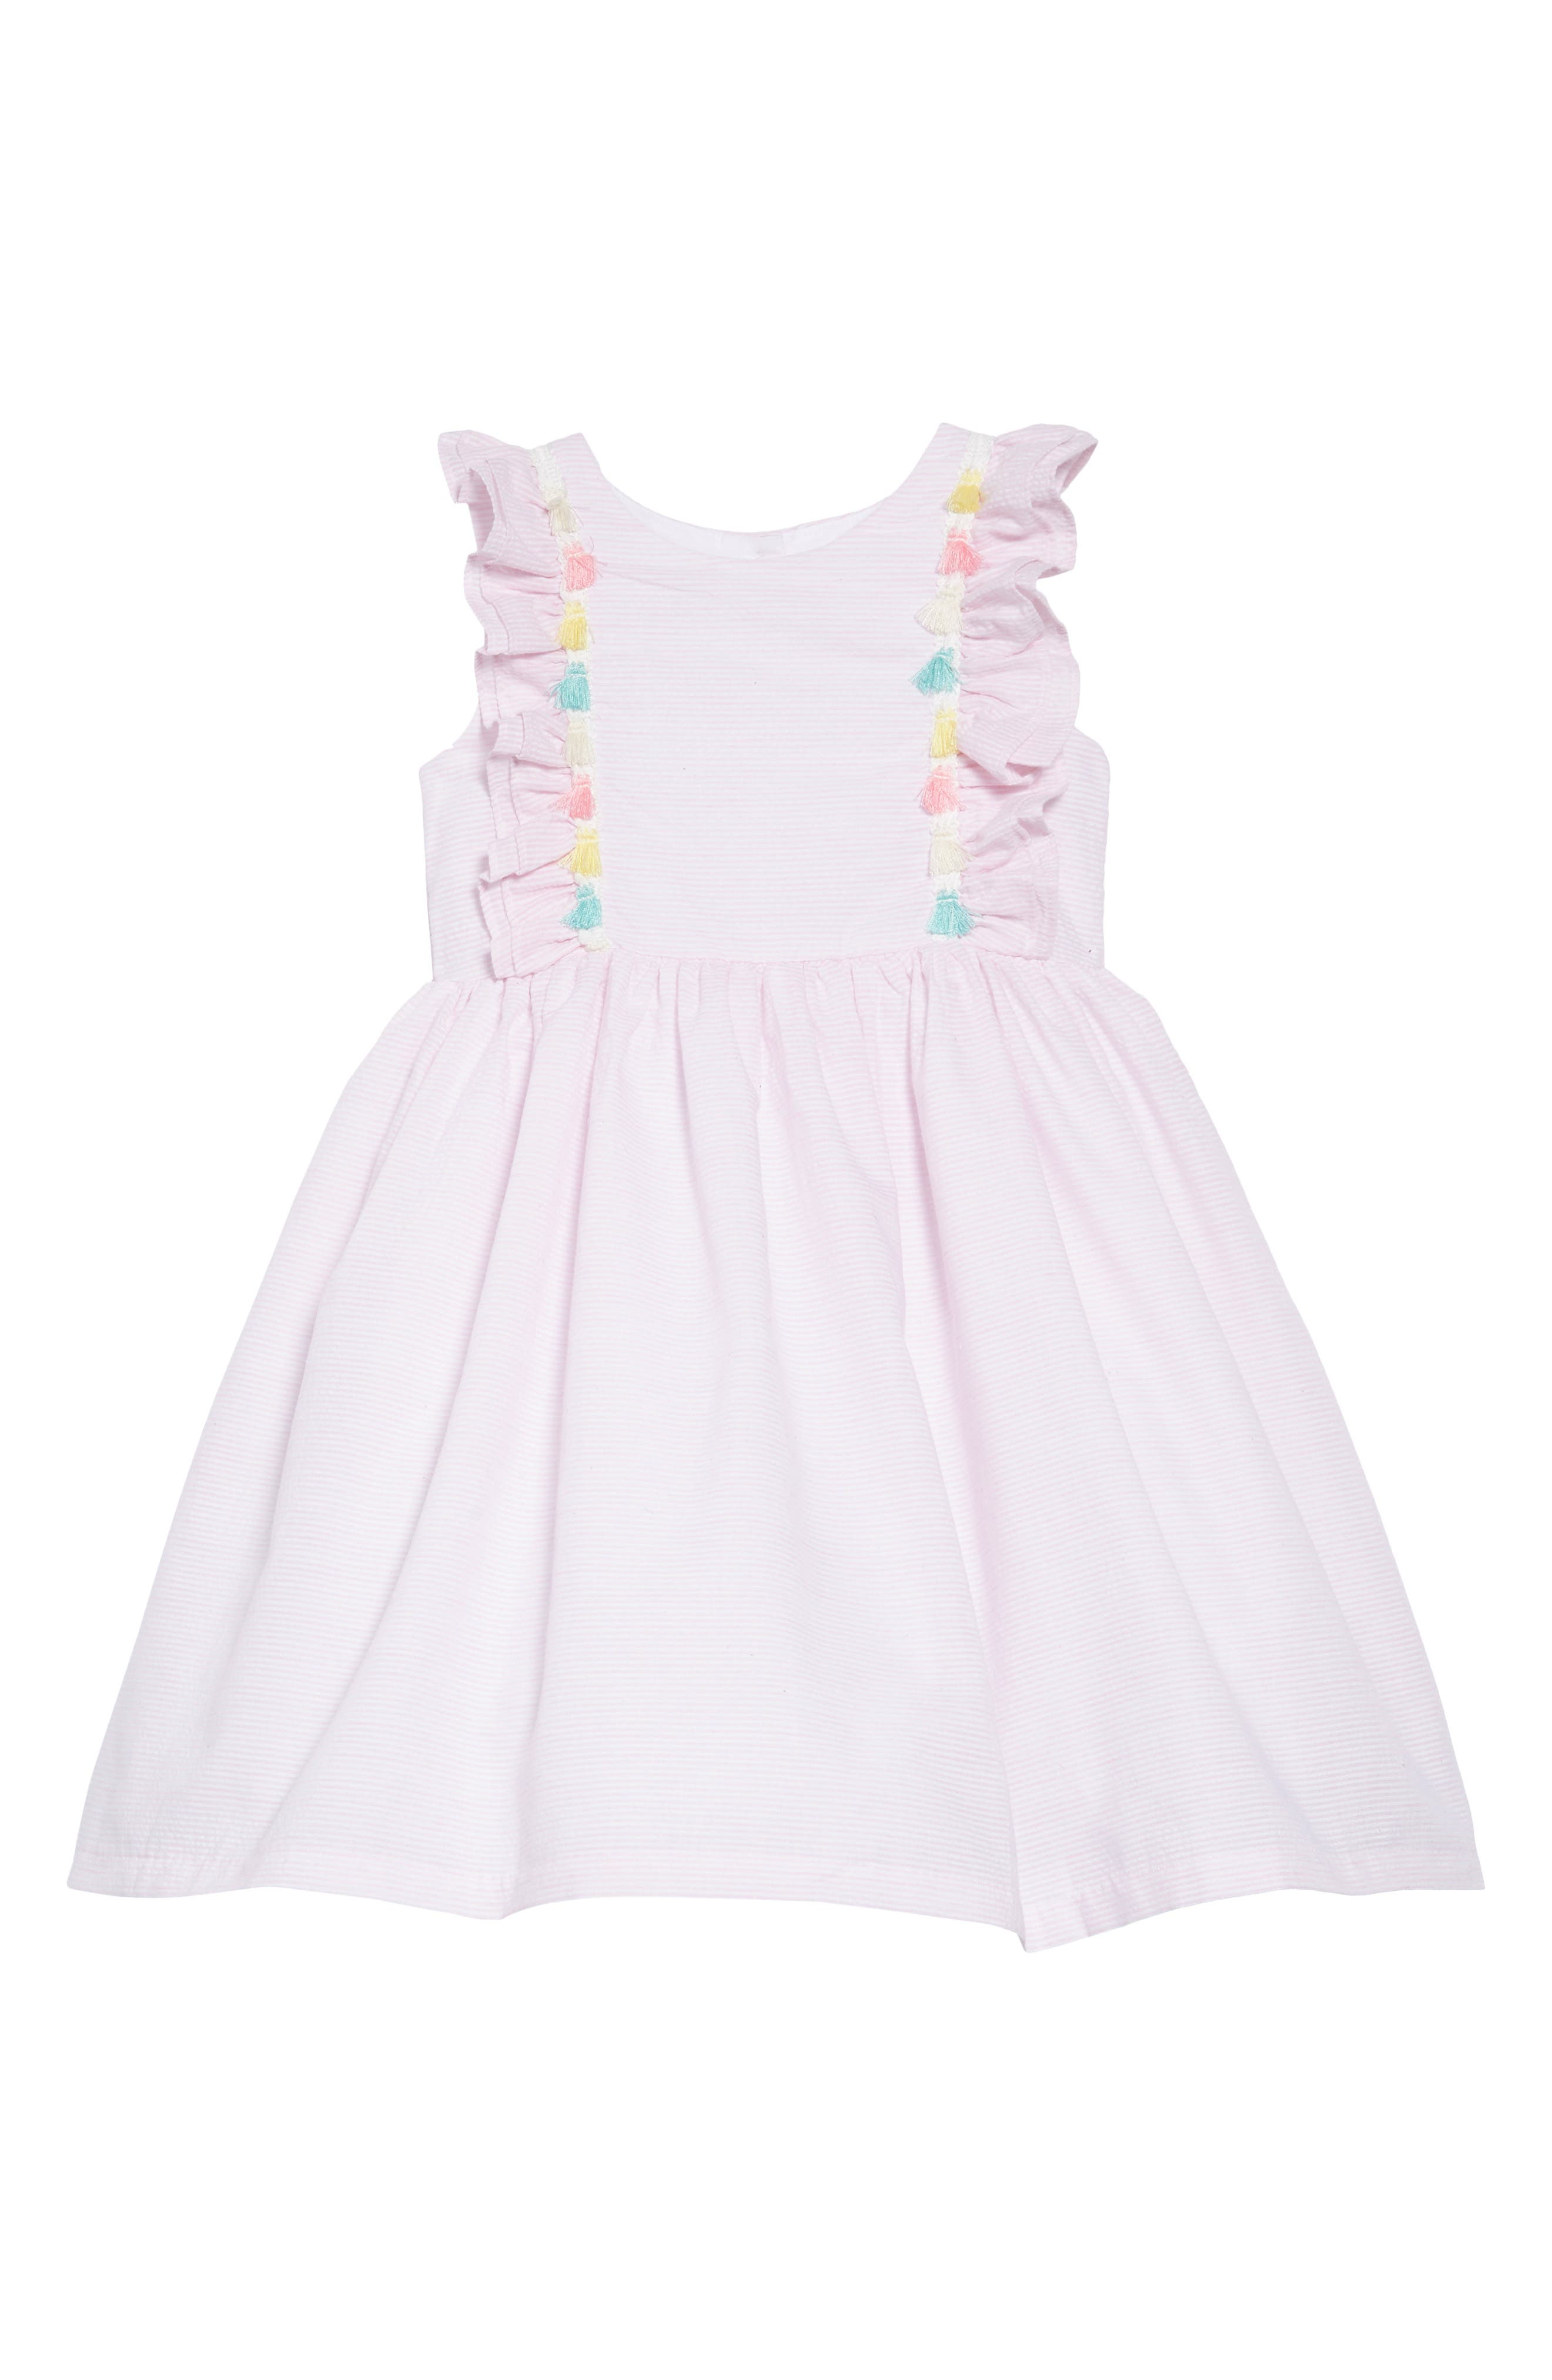 PIPPA & JULIE, Tassel Trim Seersucker Dress, Main thumbnail 1, color, 650